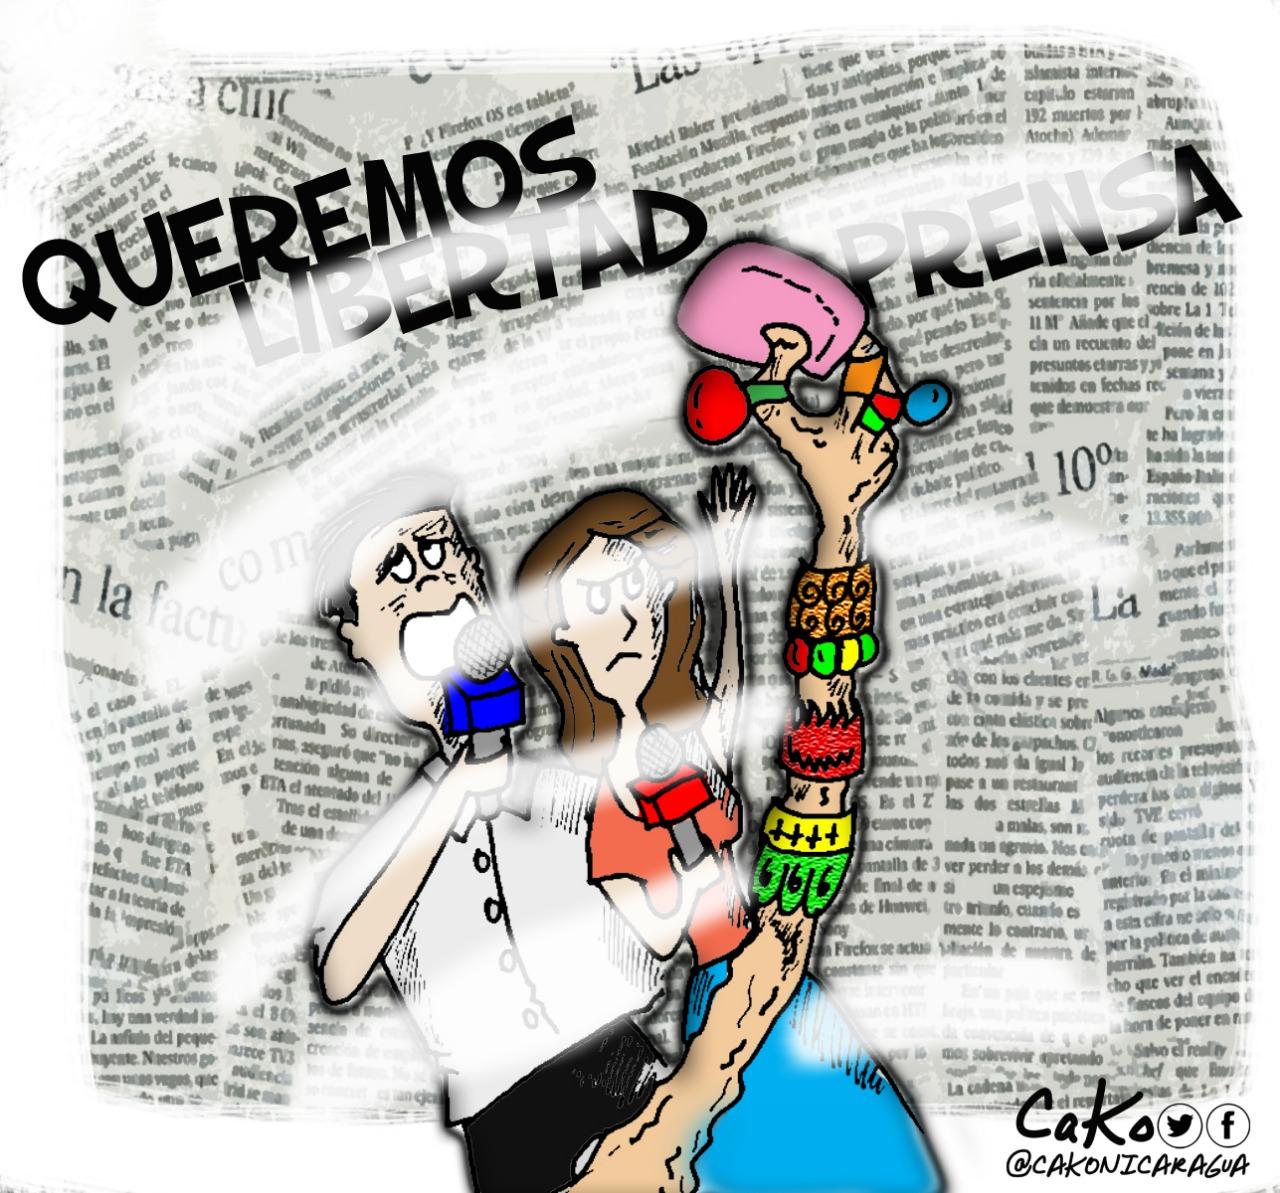 La Caricatura: Por la libertad de prensa, ¡Resistimos!